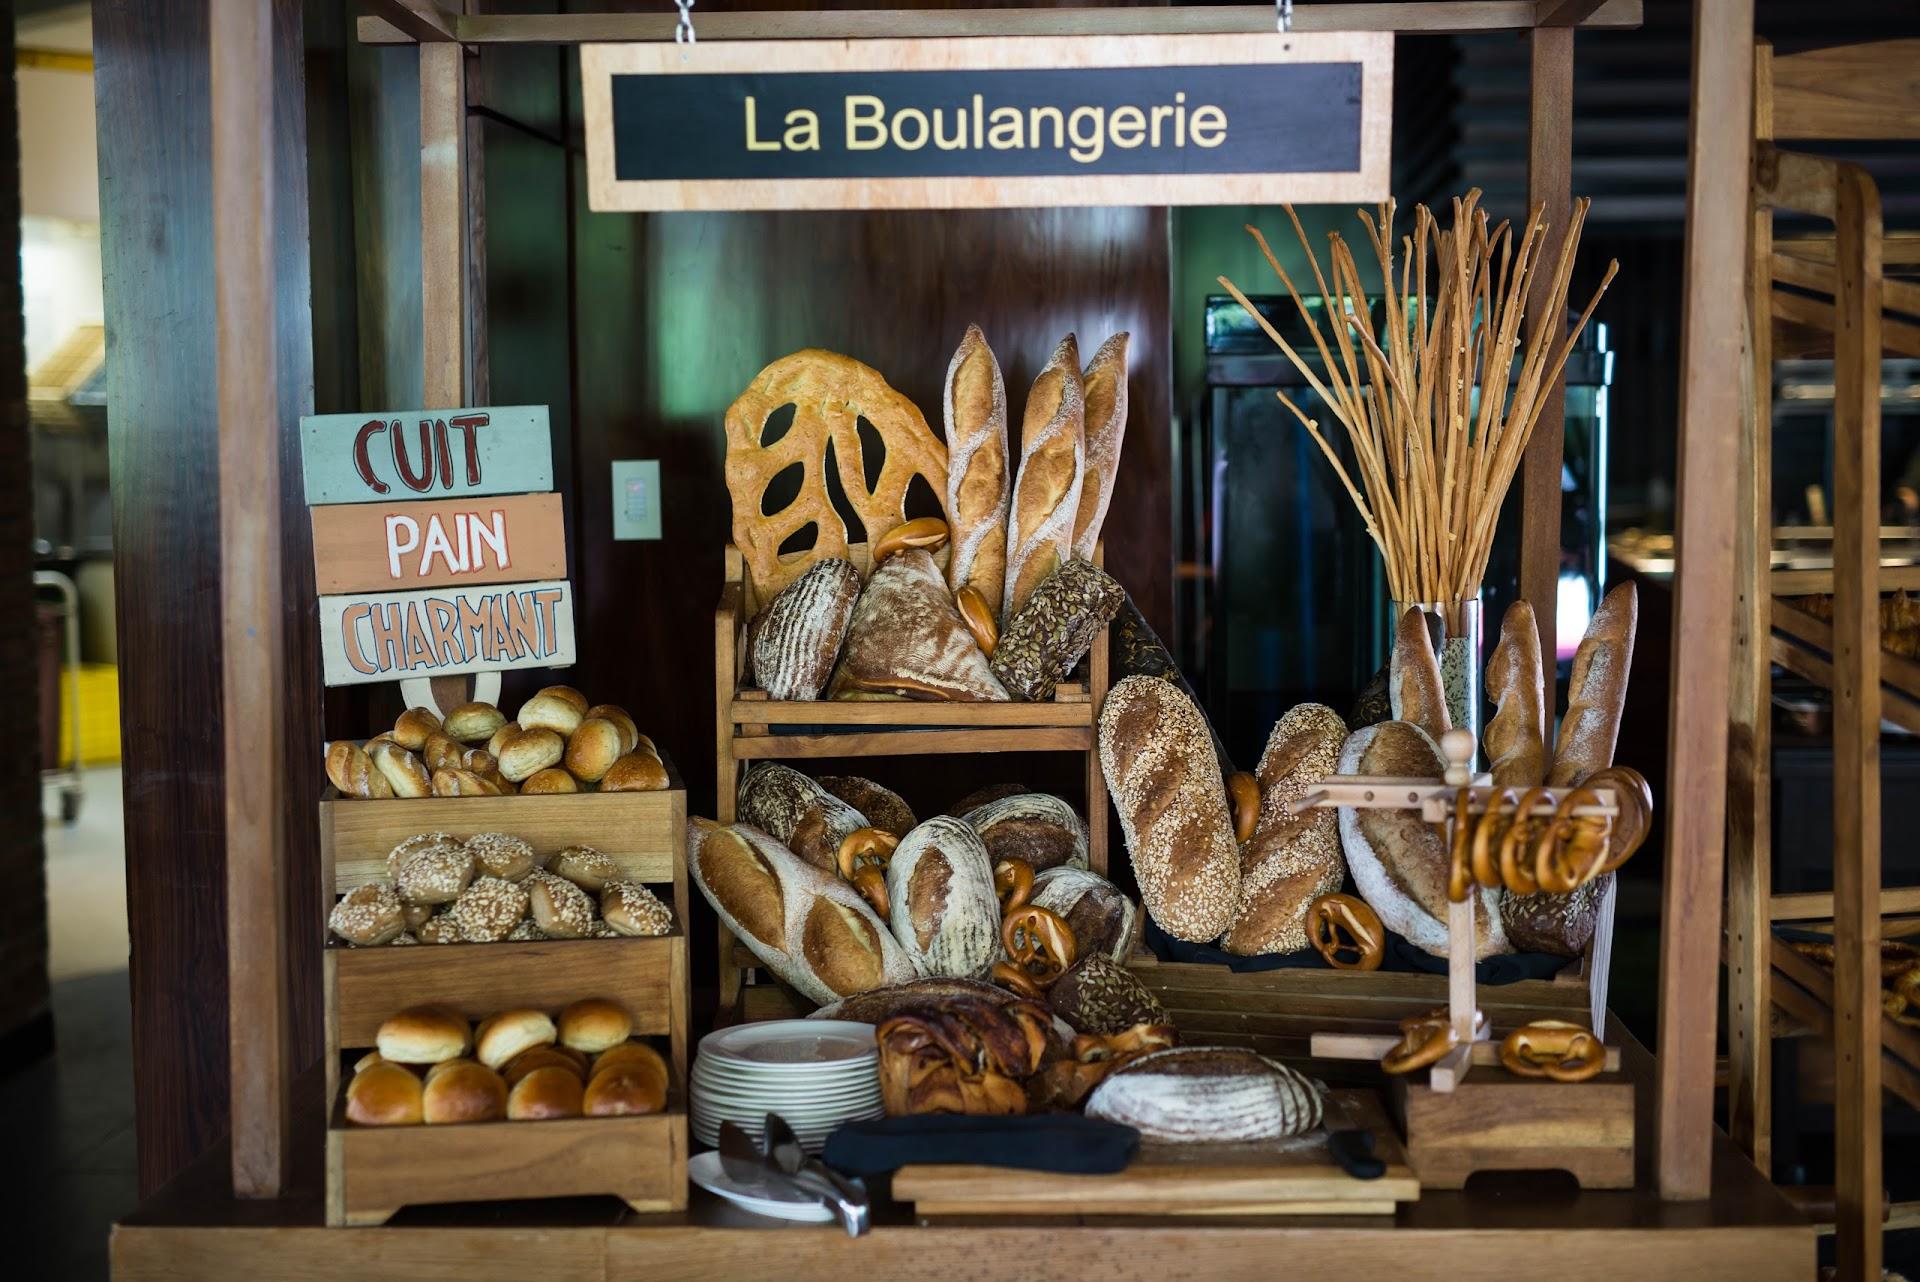 sofitel nusa dua weekend brunch, bread buffet, babka, what to eat in bali, best brunch, buffet in the world